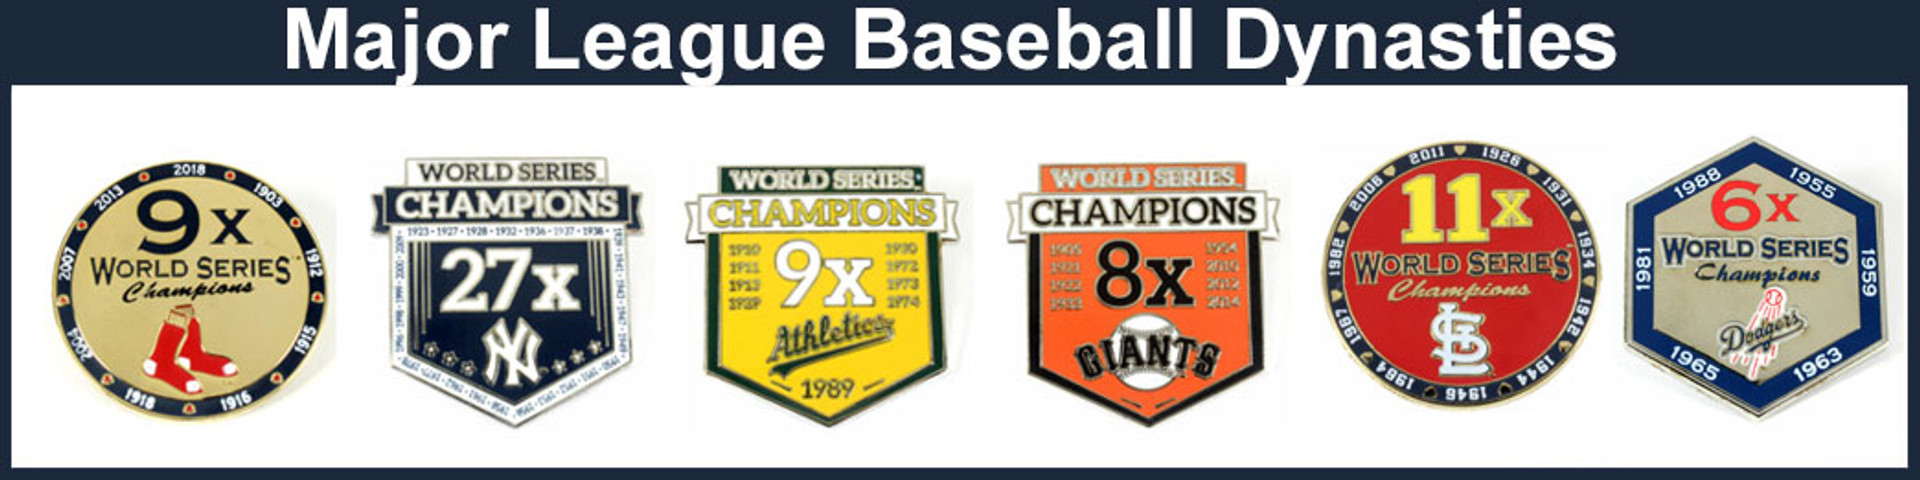 MLB World Series Champs Pins